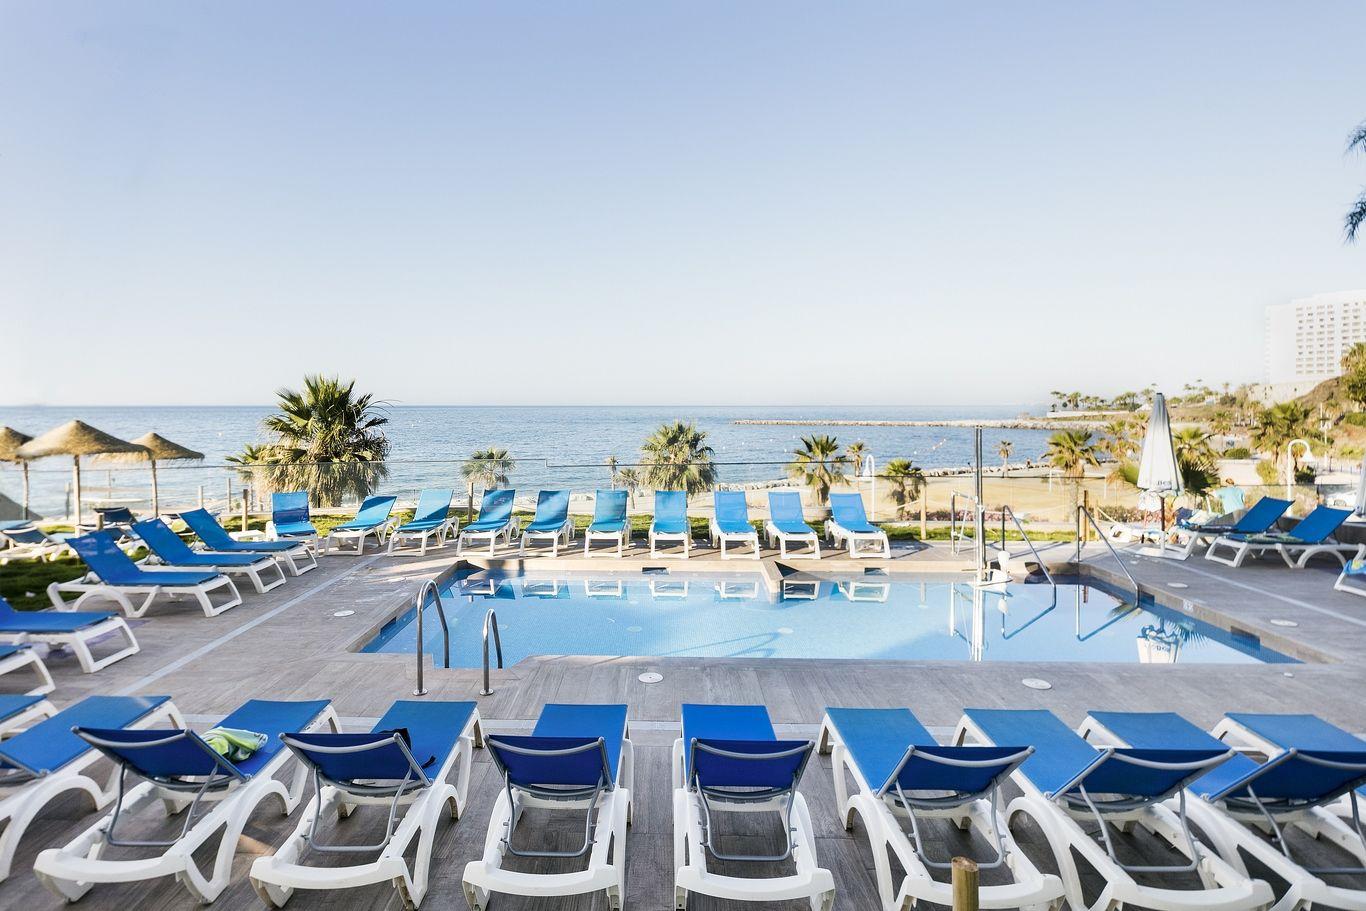 Espagne - Andalousie - Benalmadena - Hôtel Best Benalmadena 4*